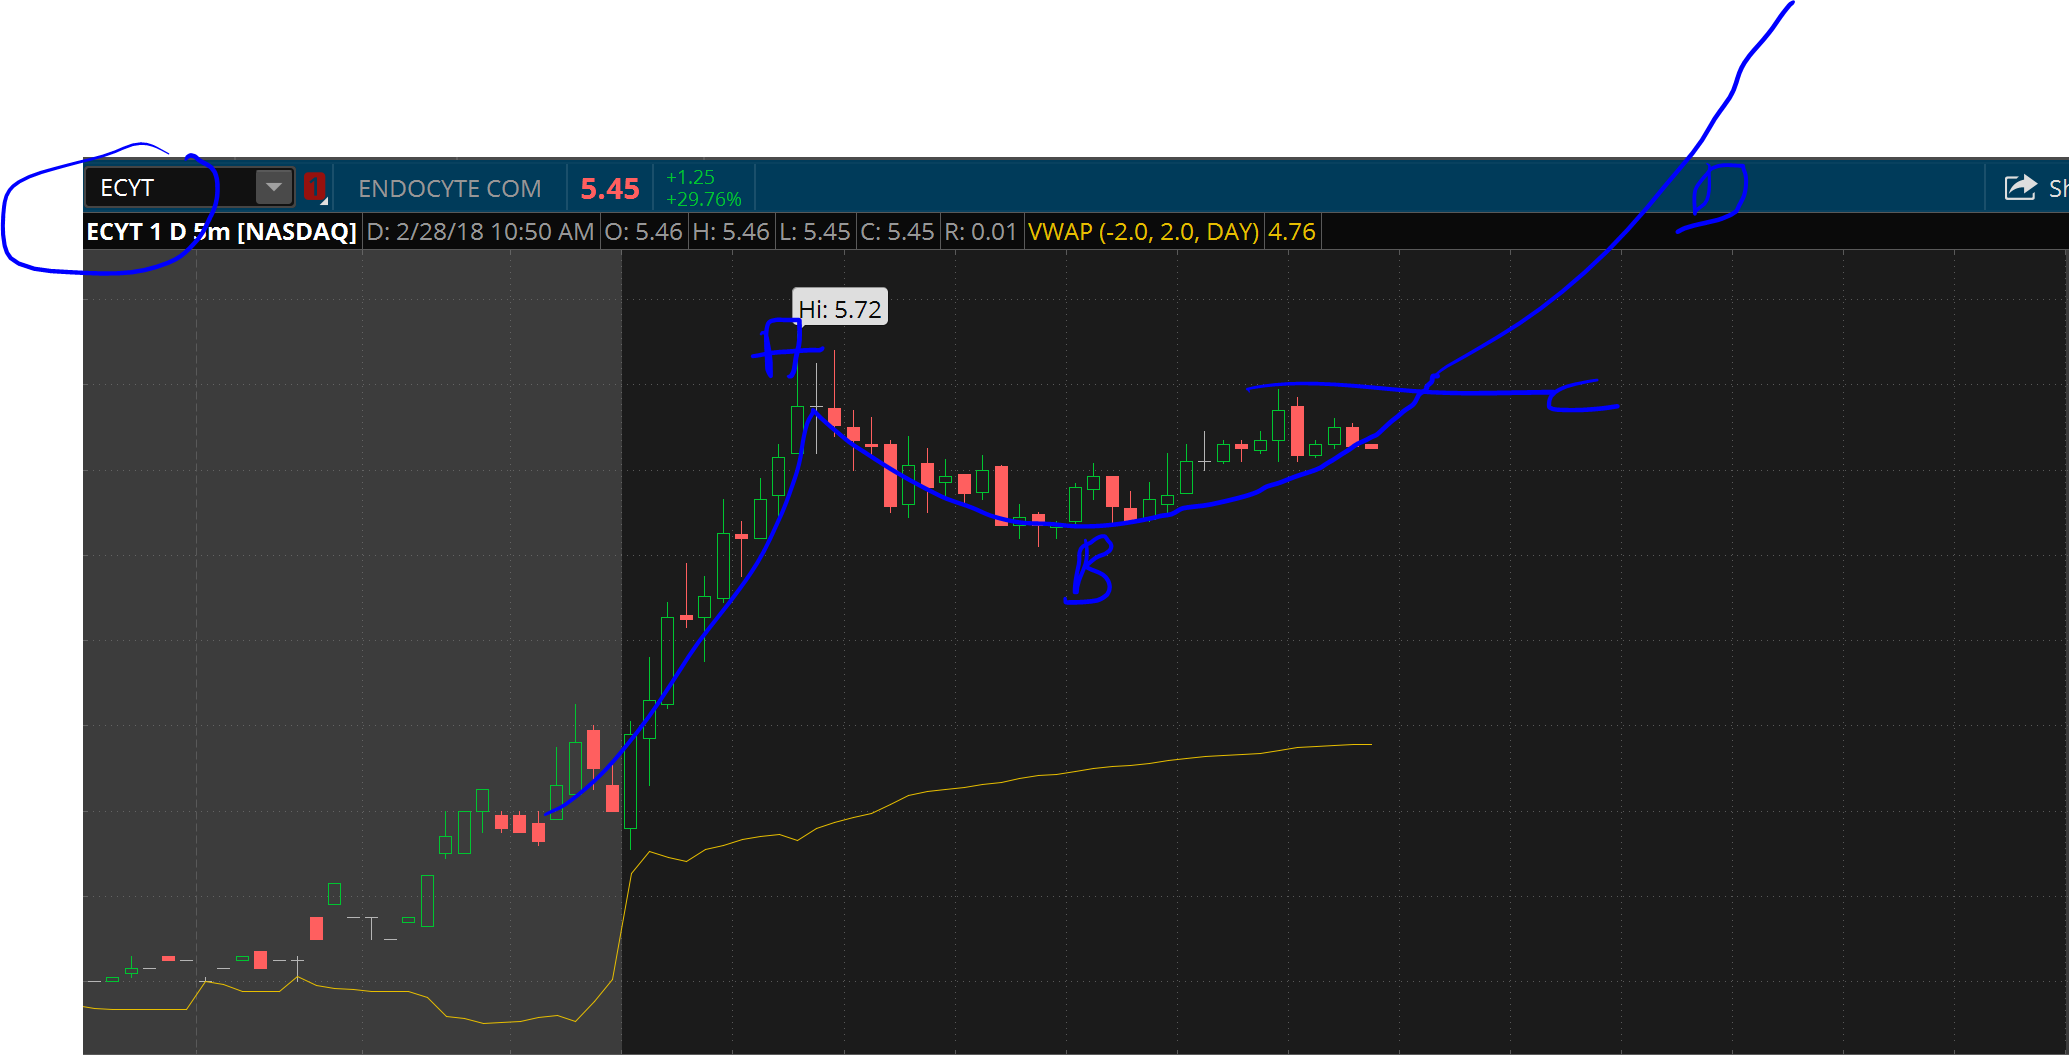 Helios & Matheson Information Technology Inc (HMNY) Stock Trade